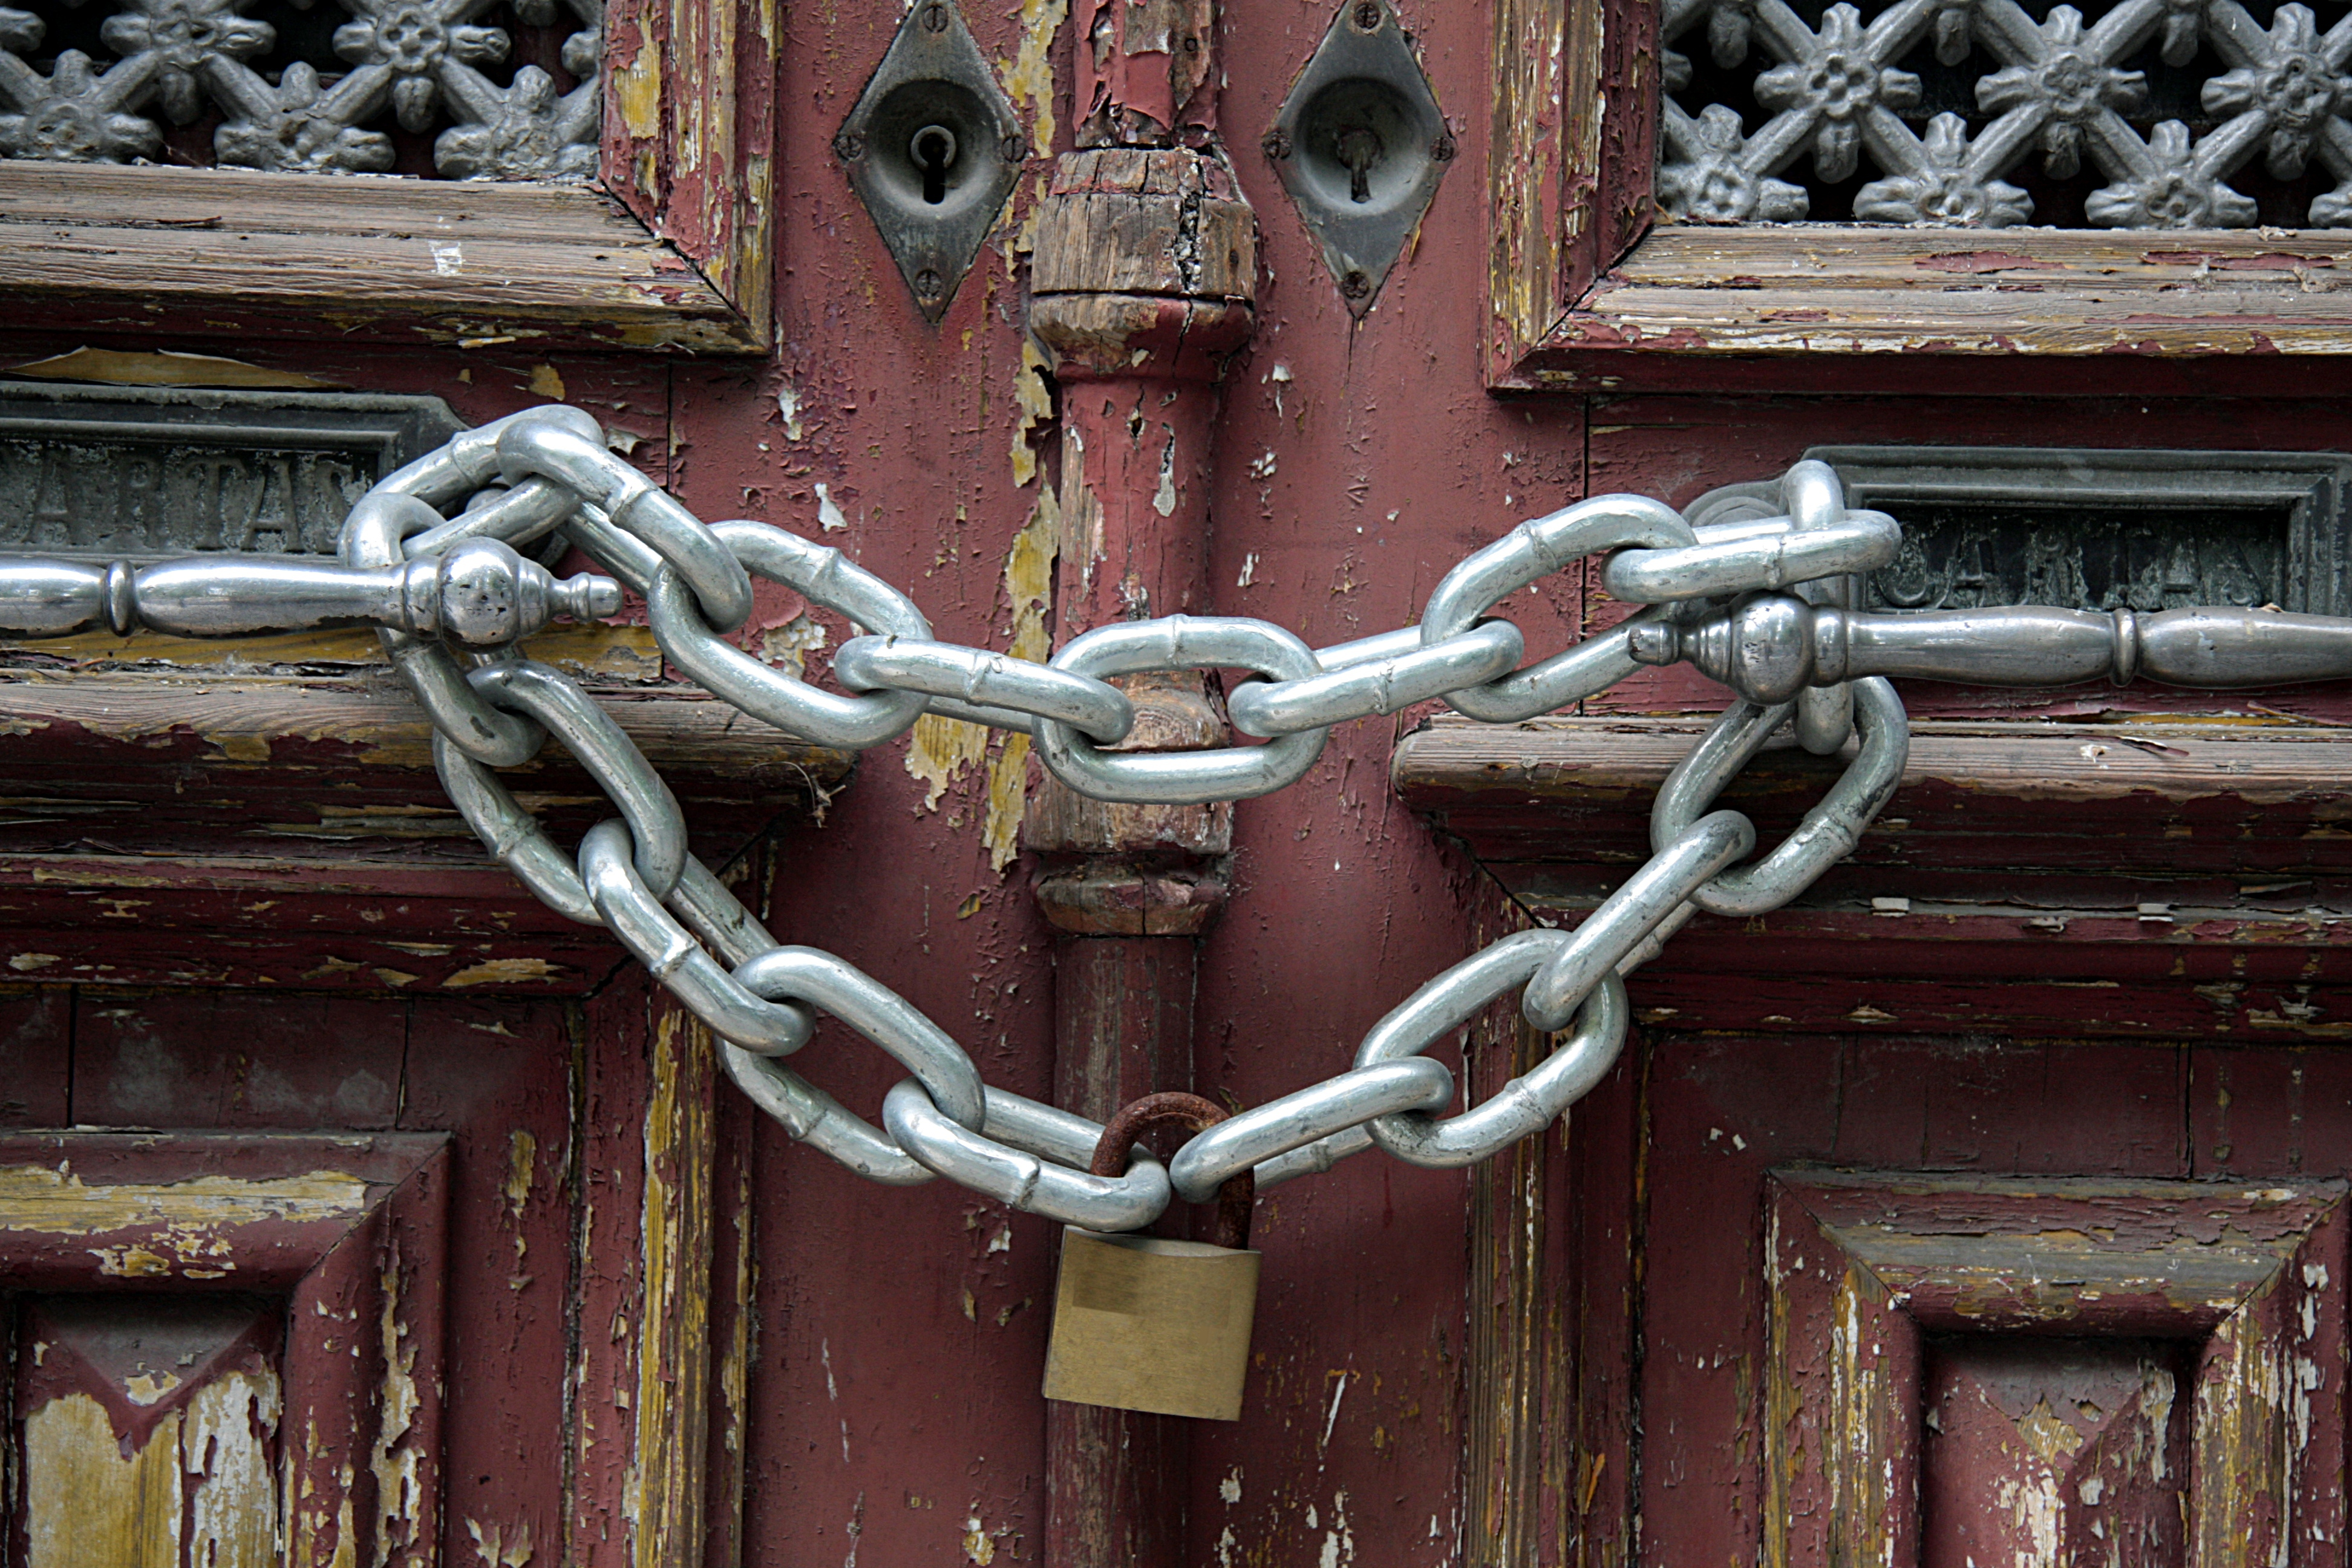 Google to Upgrade SSL Certificates to 2048-bit keys, Starting August 1